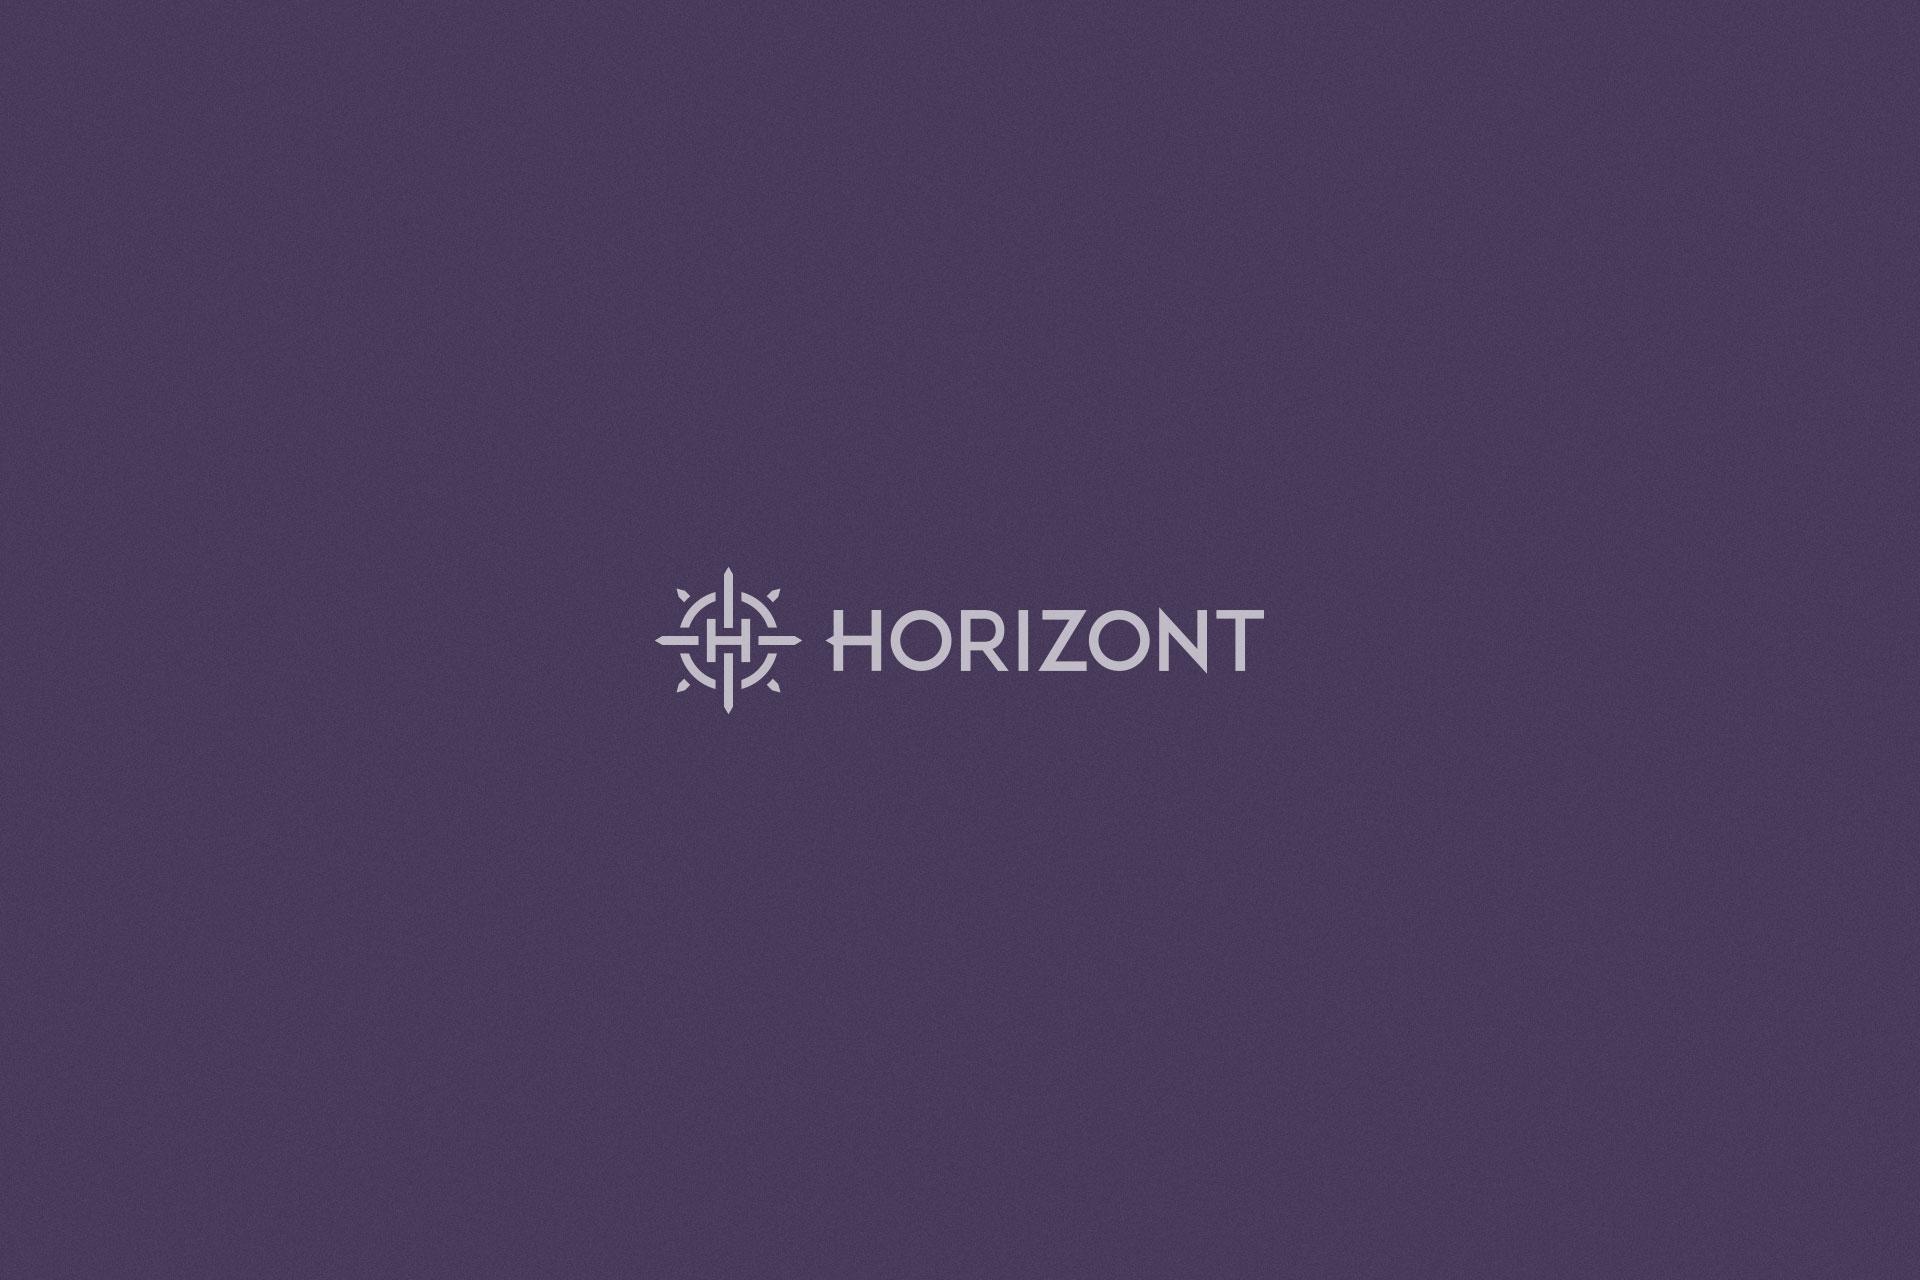 Logos & Brandmarks Horizont